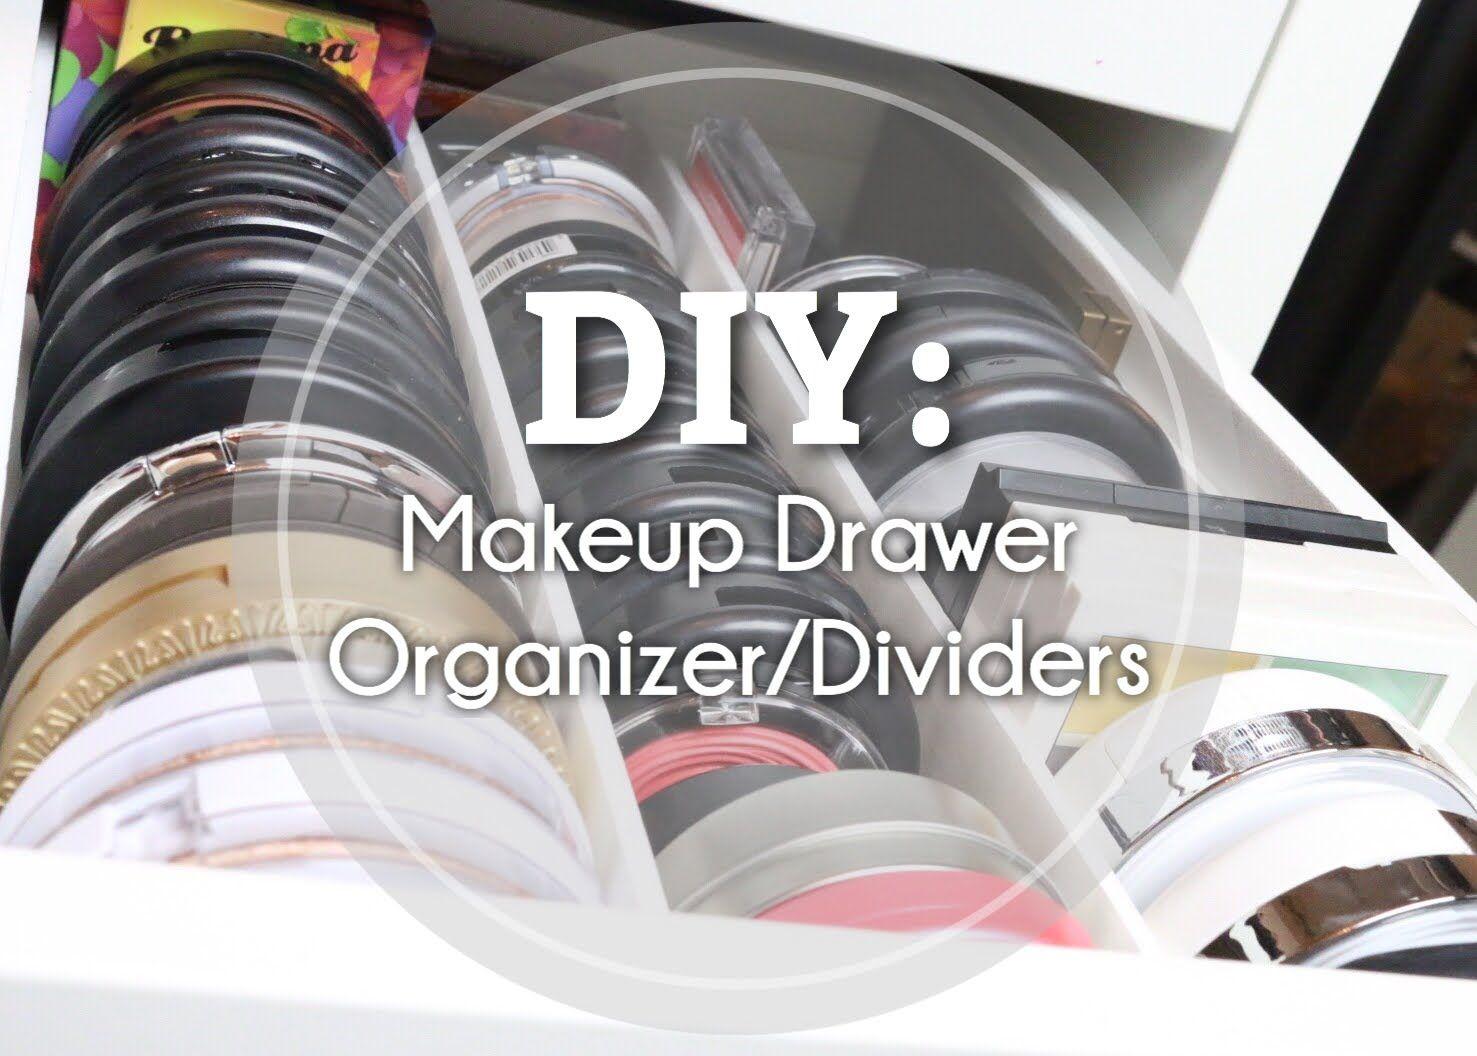 Diy makeup drawer organizerdivider beauty room ideas pinterest